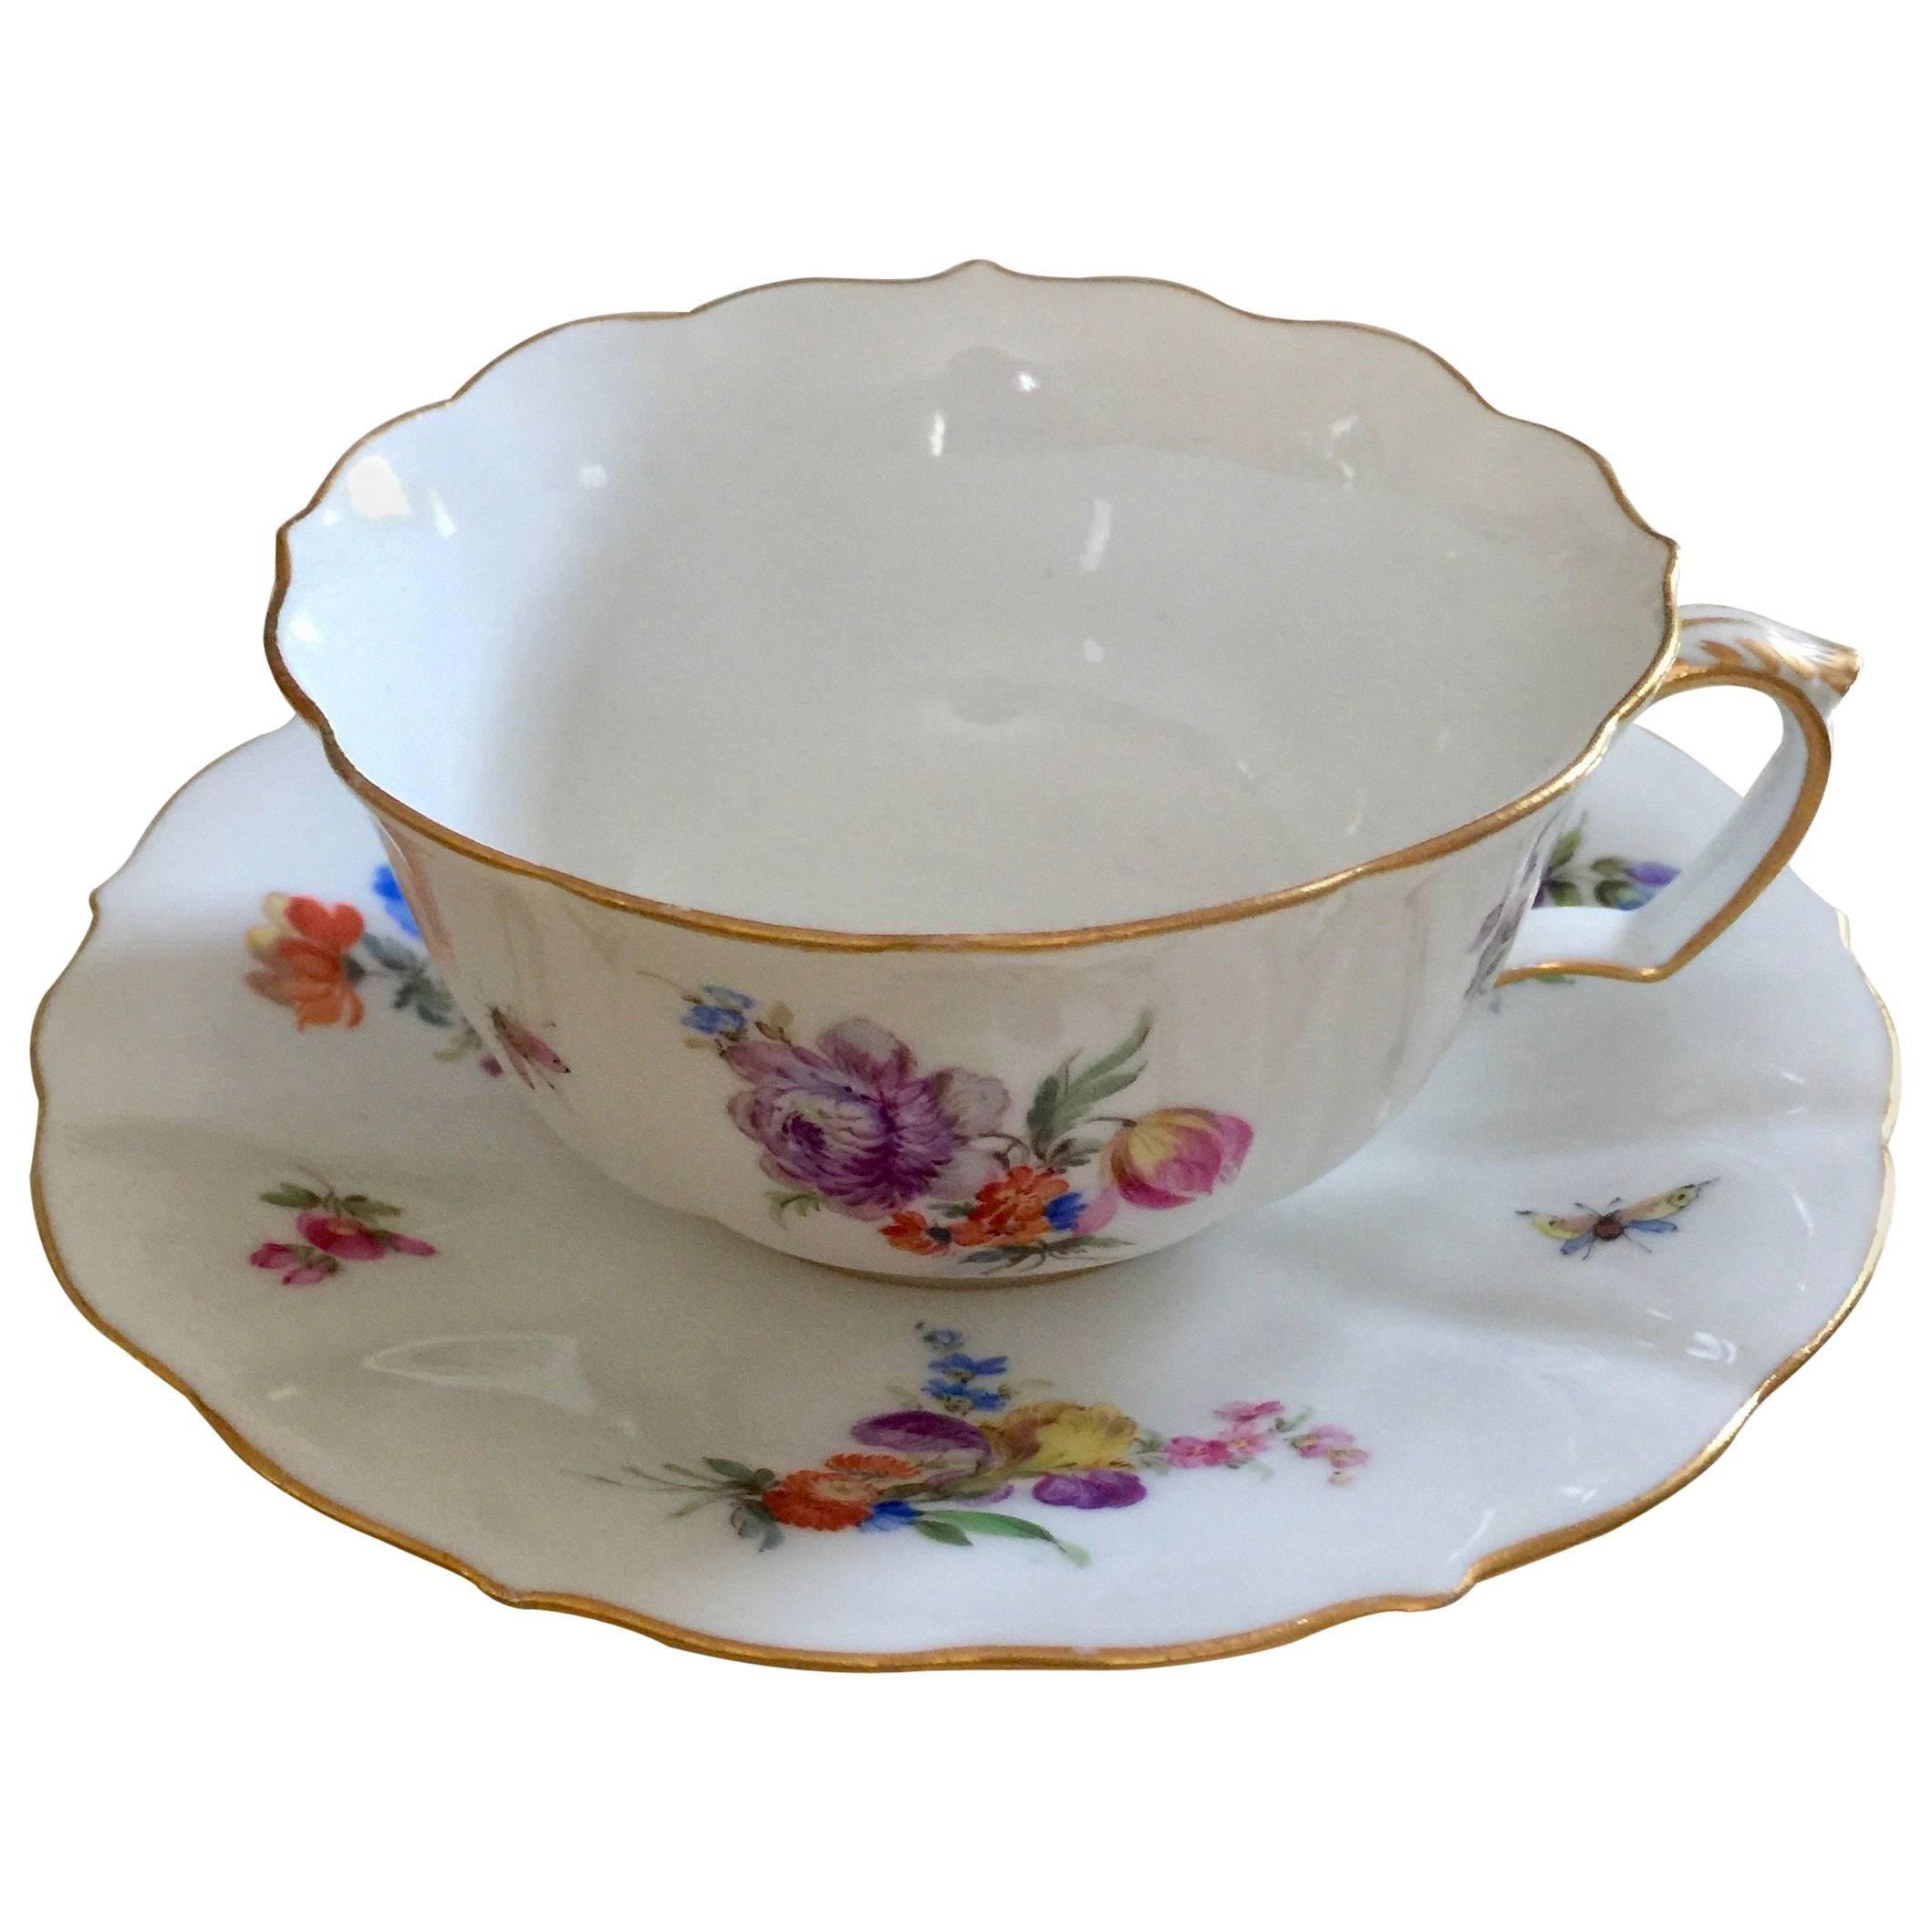 19th Century Meissen  Porcelain Painted Gilt Cup & Saucer